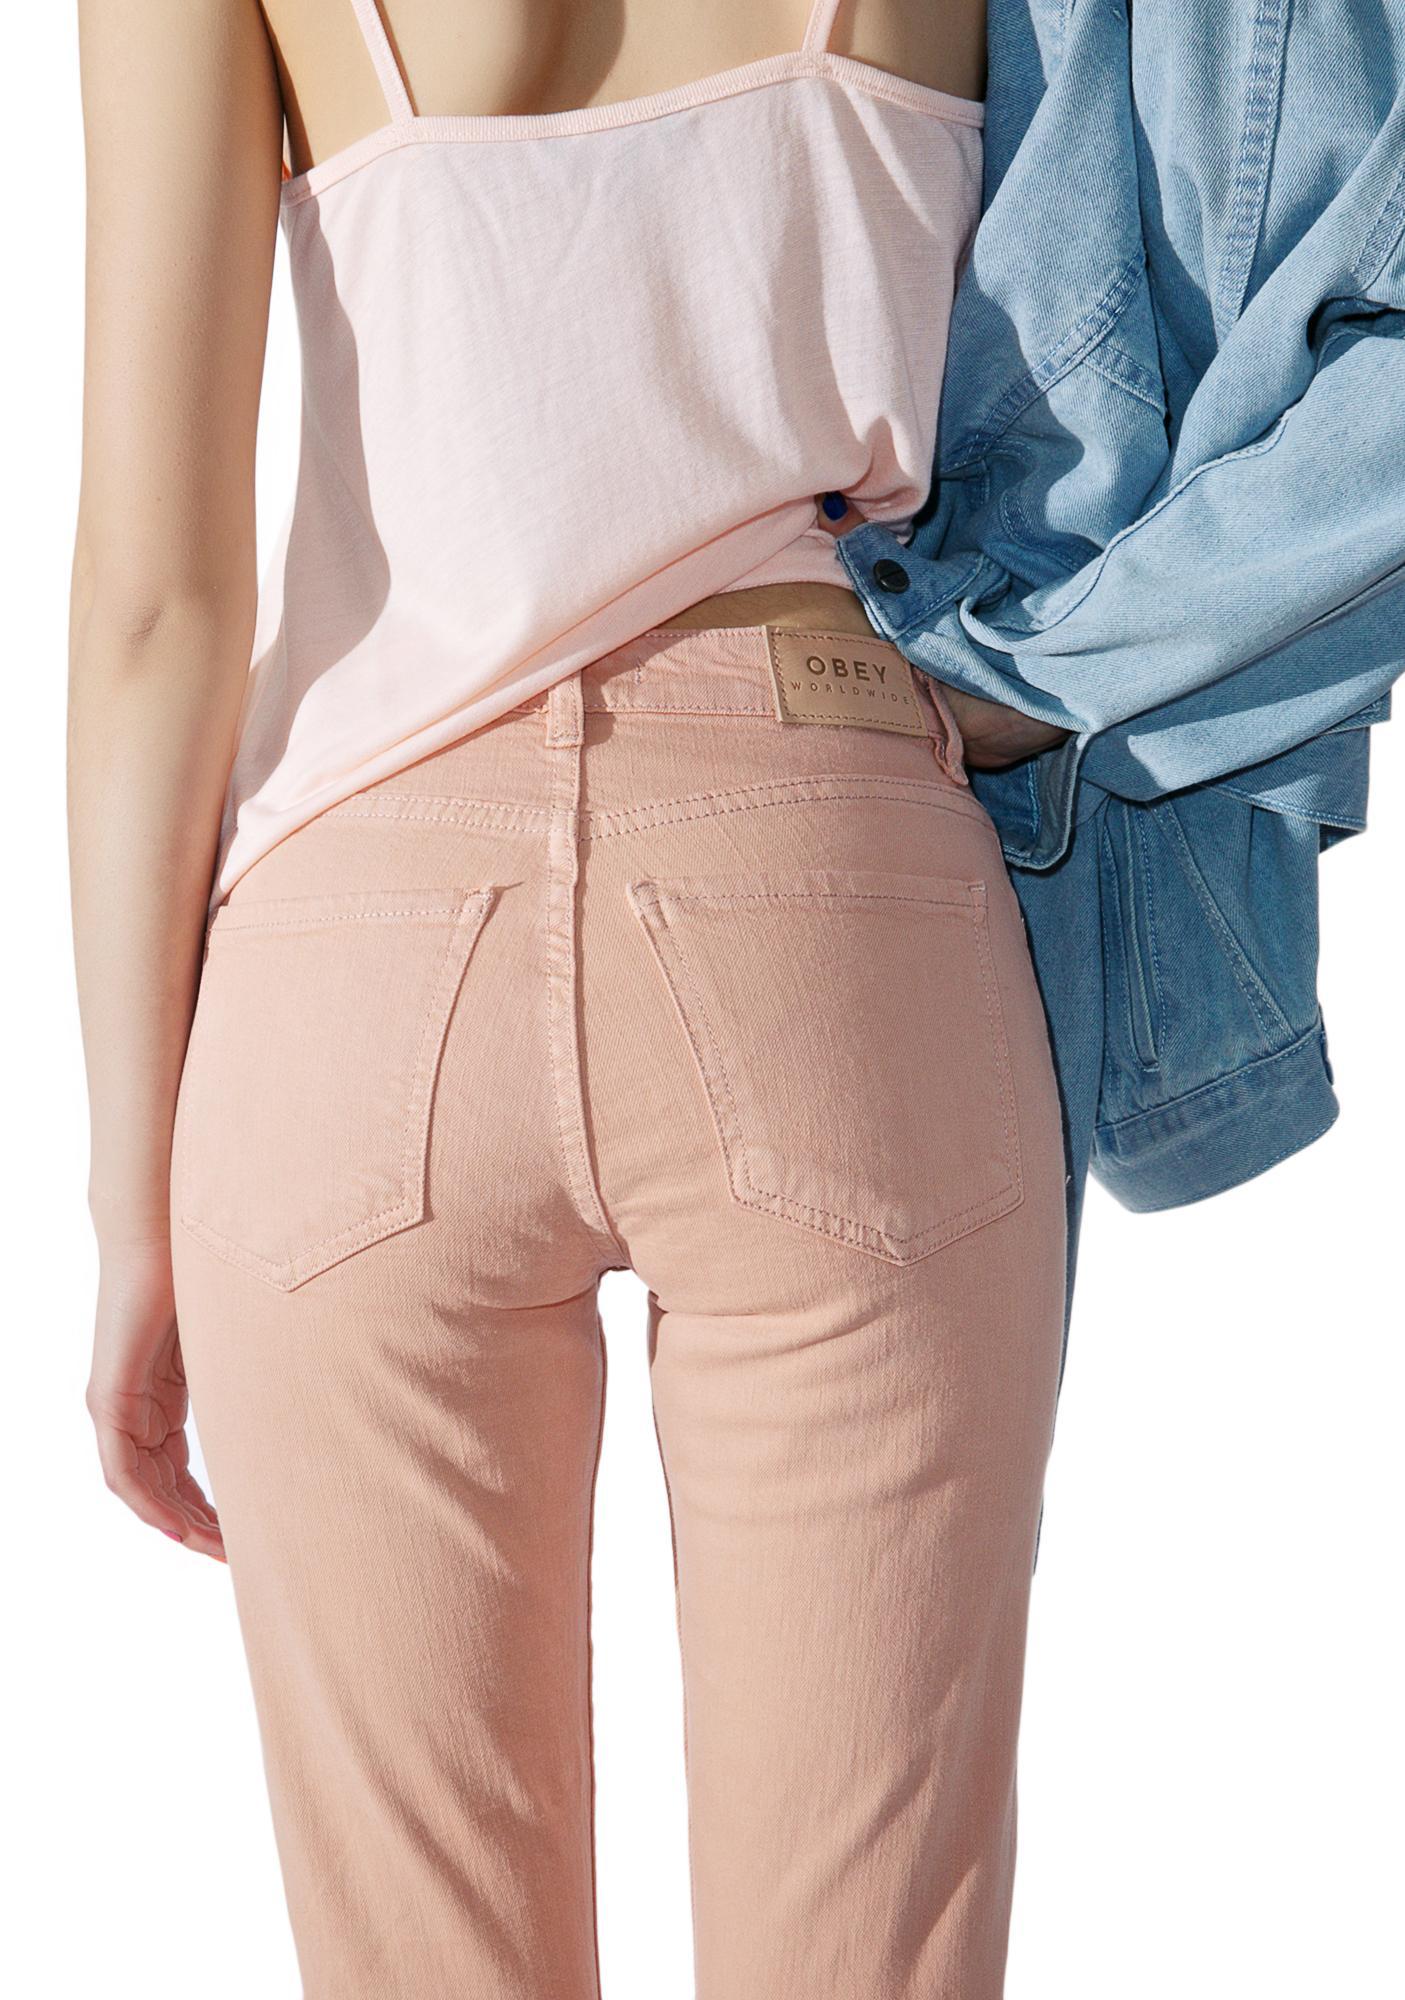 Obey Slasher Skinny II Pants